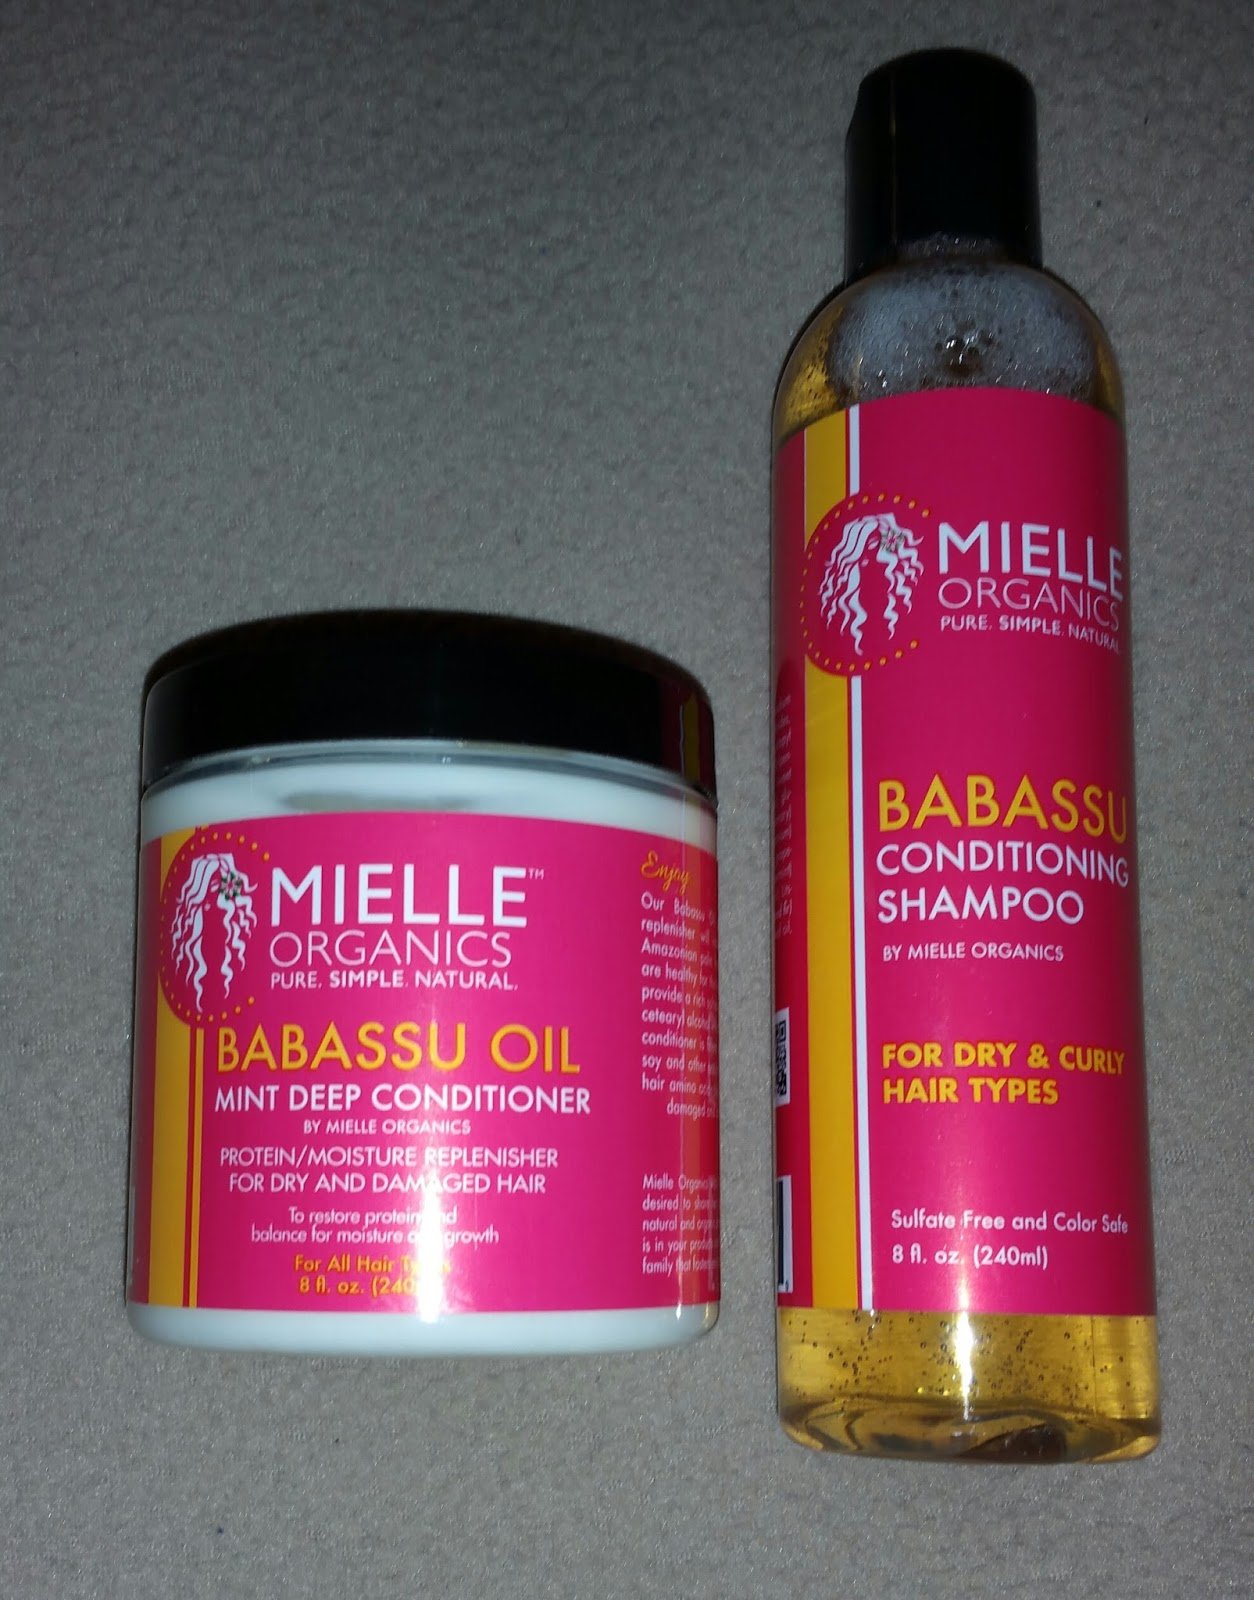 Organics shampoo and conditioner